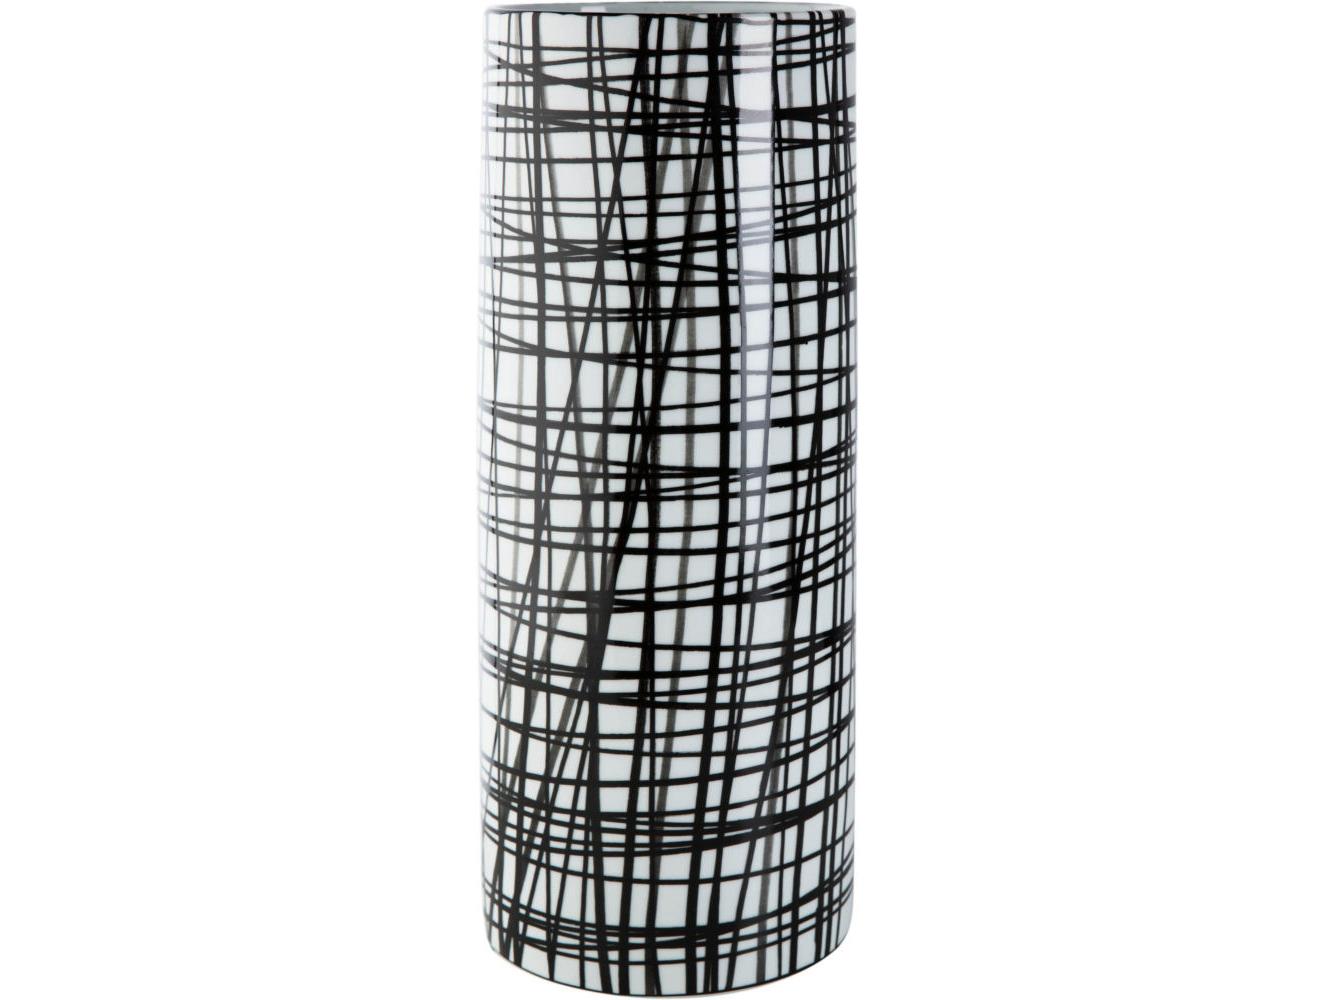 Декоративная ваза M-Style 15436456 от thefurnish